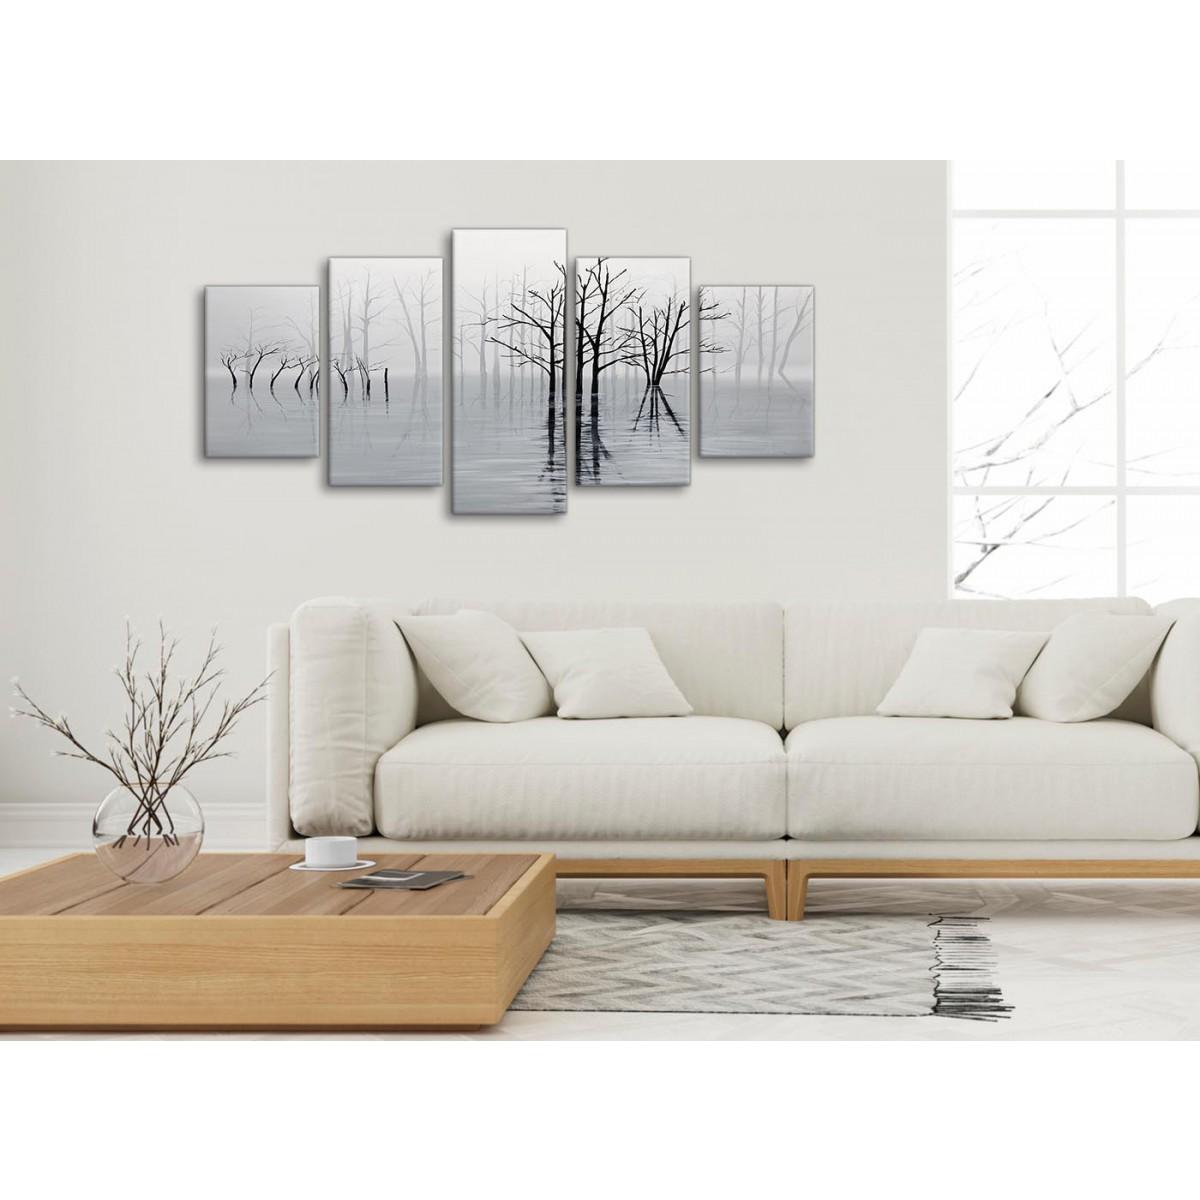 Bedroom Canvas Wall Art Uk